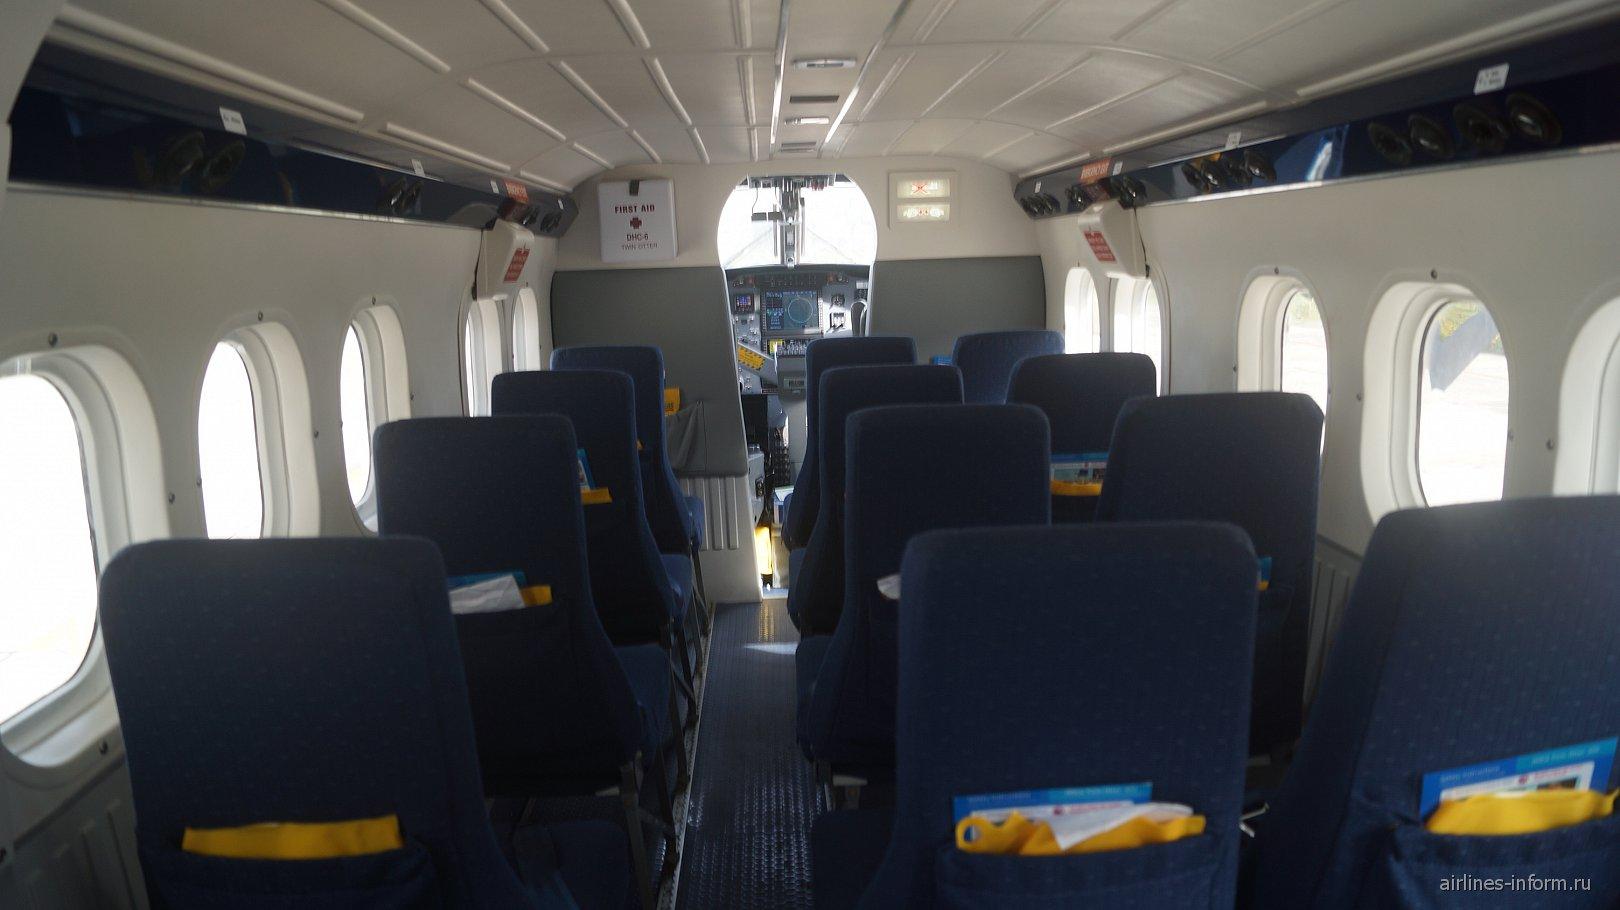 Пассажирский салон самолета DHC-6 авиакомпании Air Seychelles